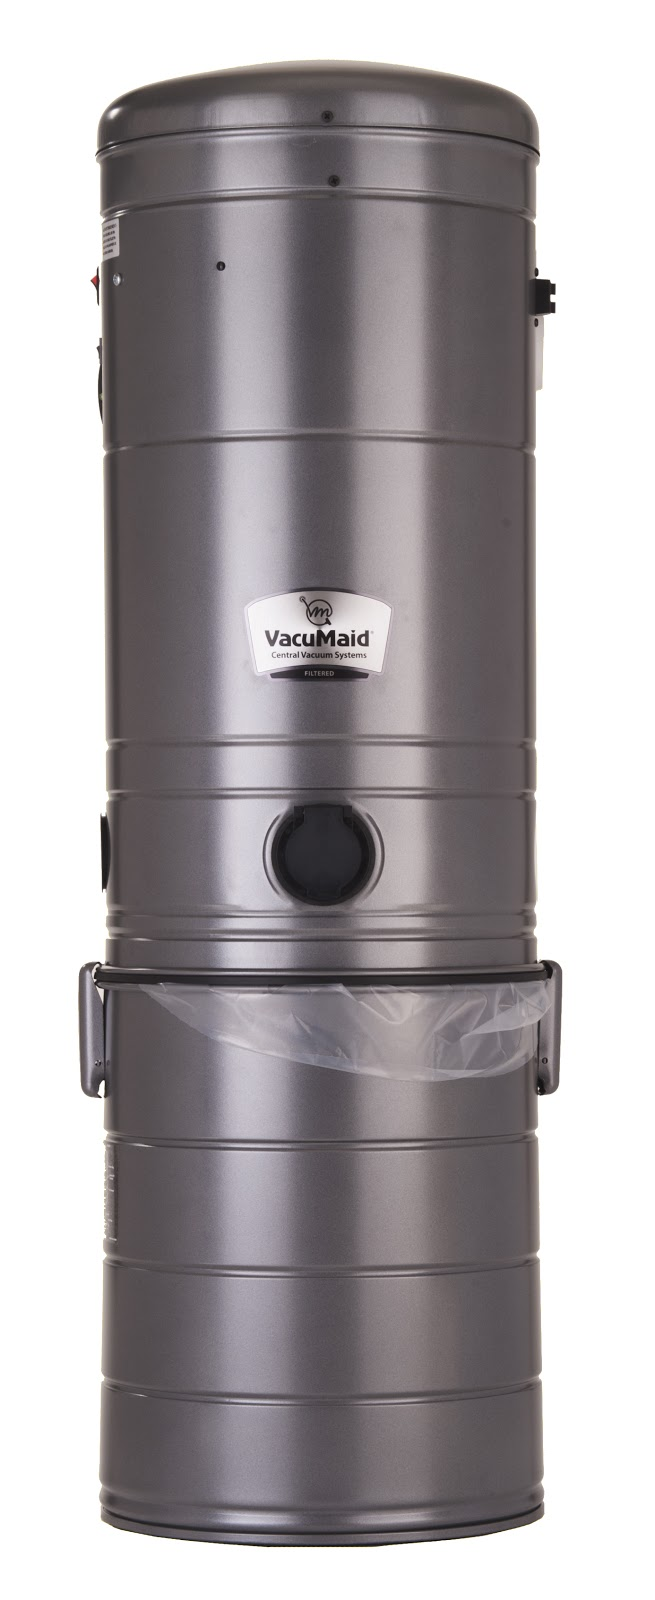 VacuMaid SR46 Central Vacuum Power Unit